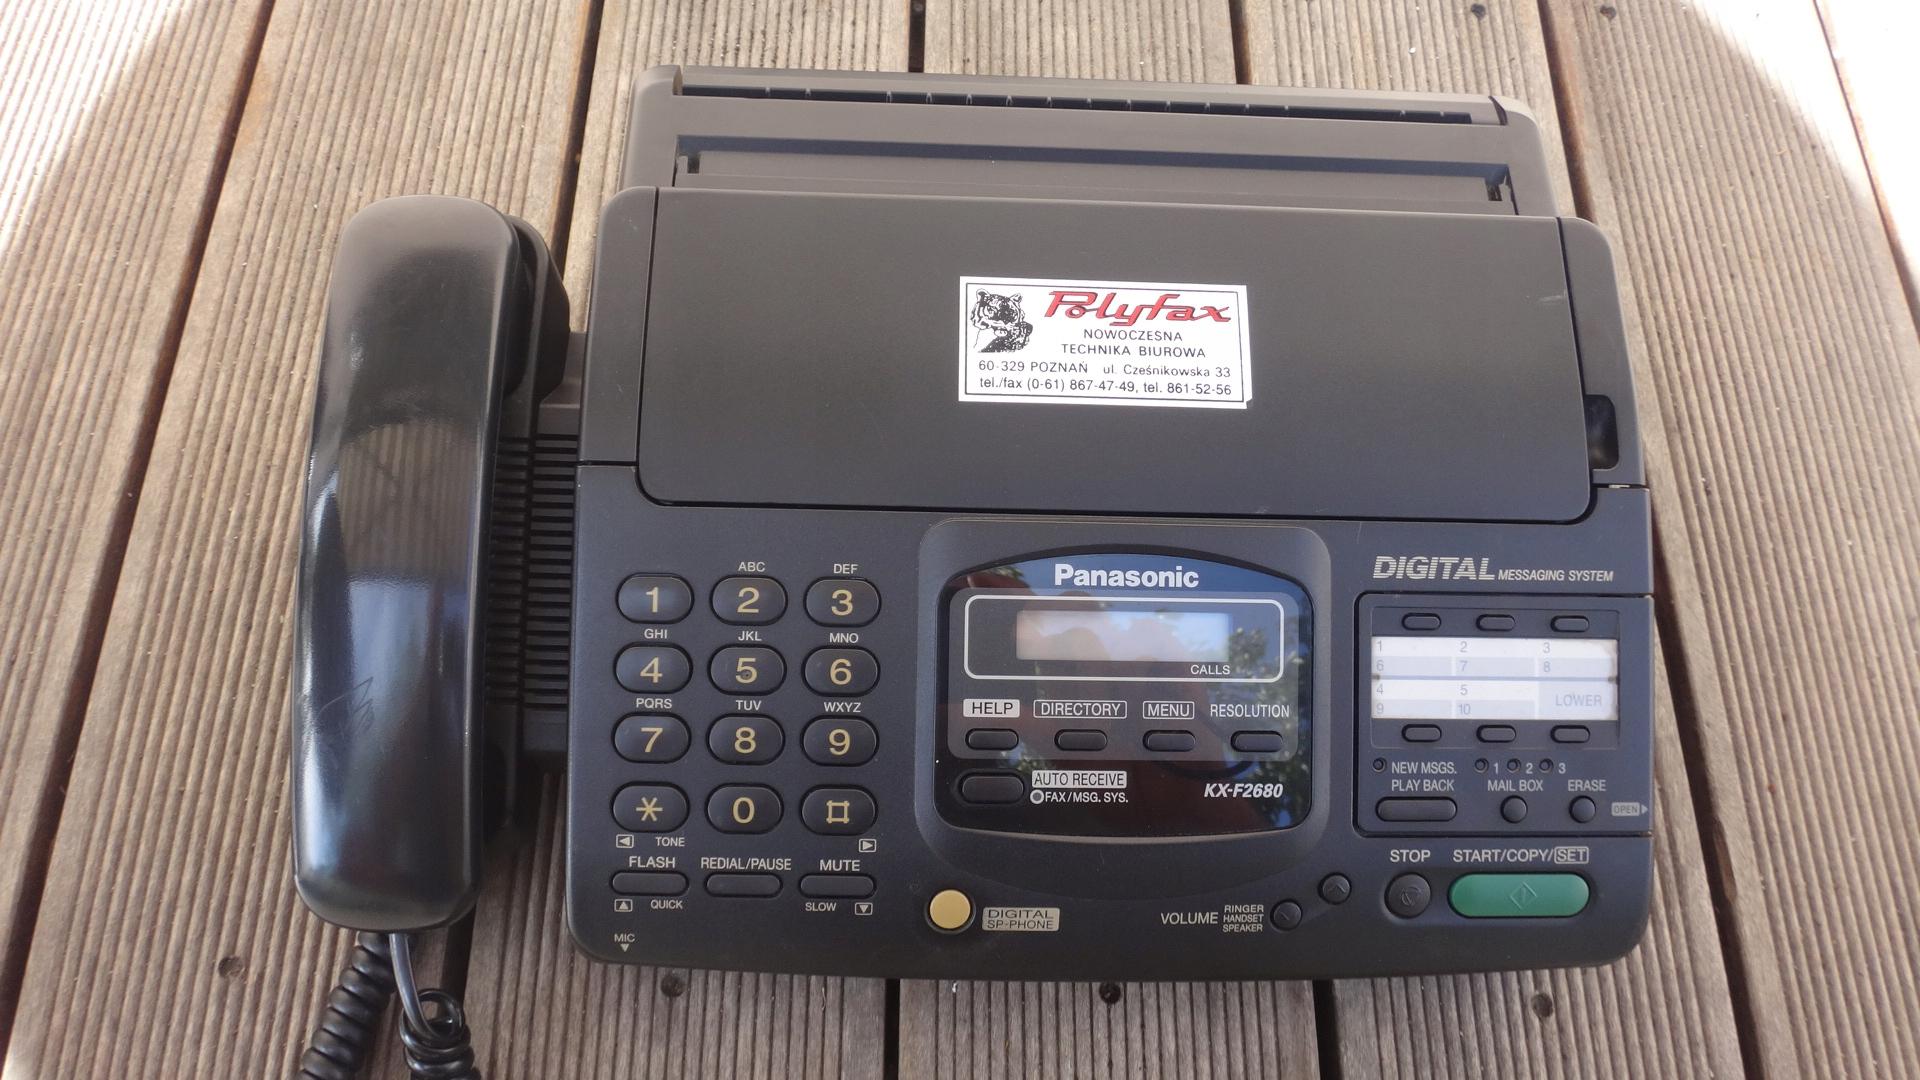 Fax Panasonic - KX-F2680